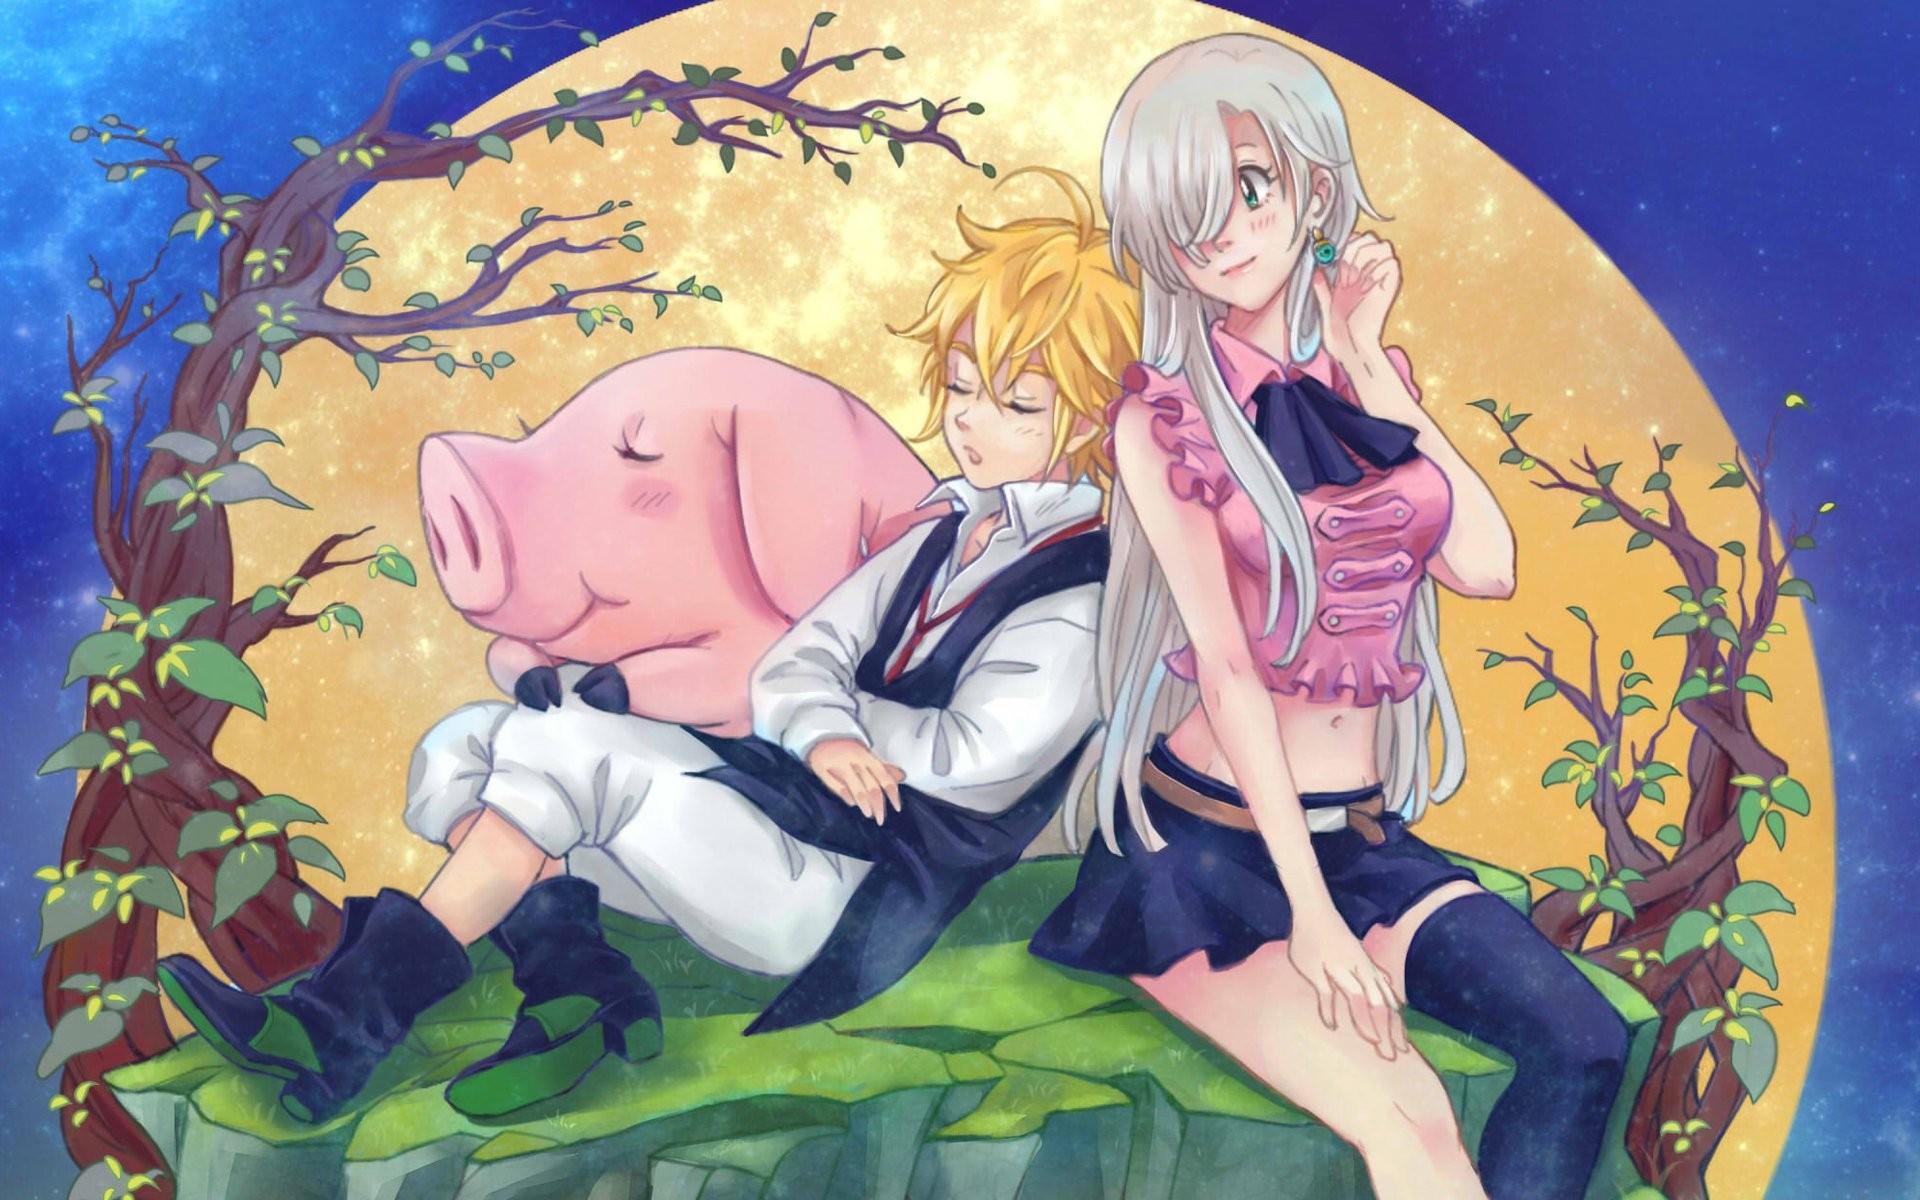 Unduh 73 Wallpaper Anime Hd Meliodas Gratis Terbaik